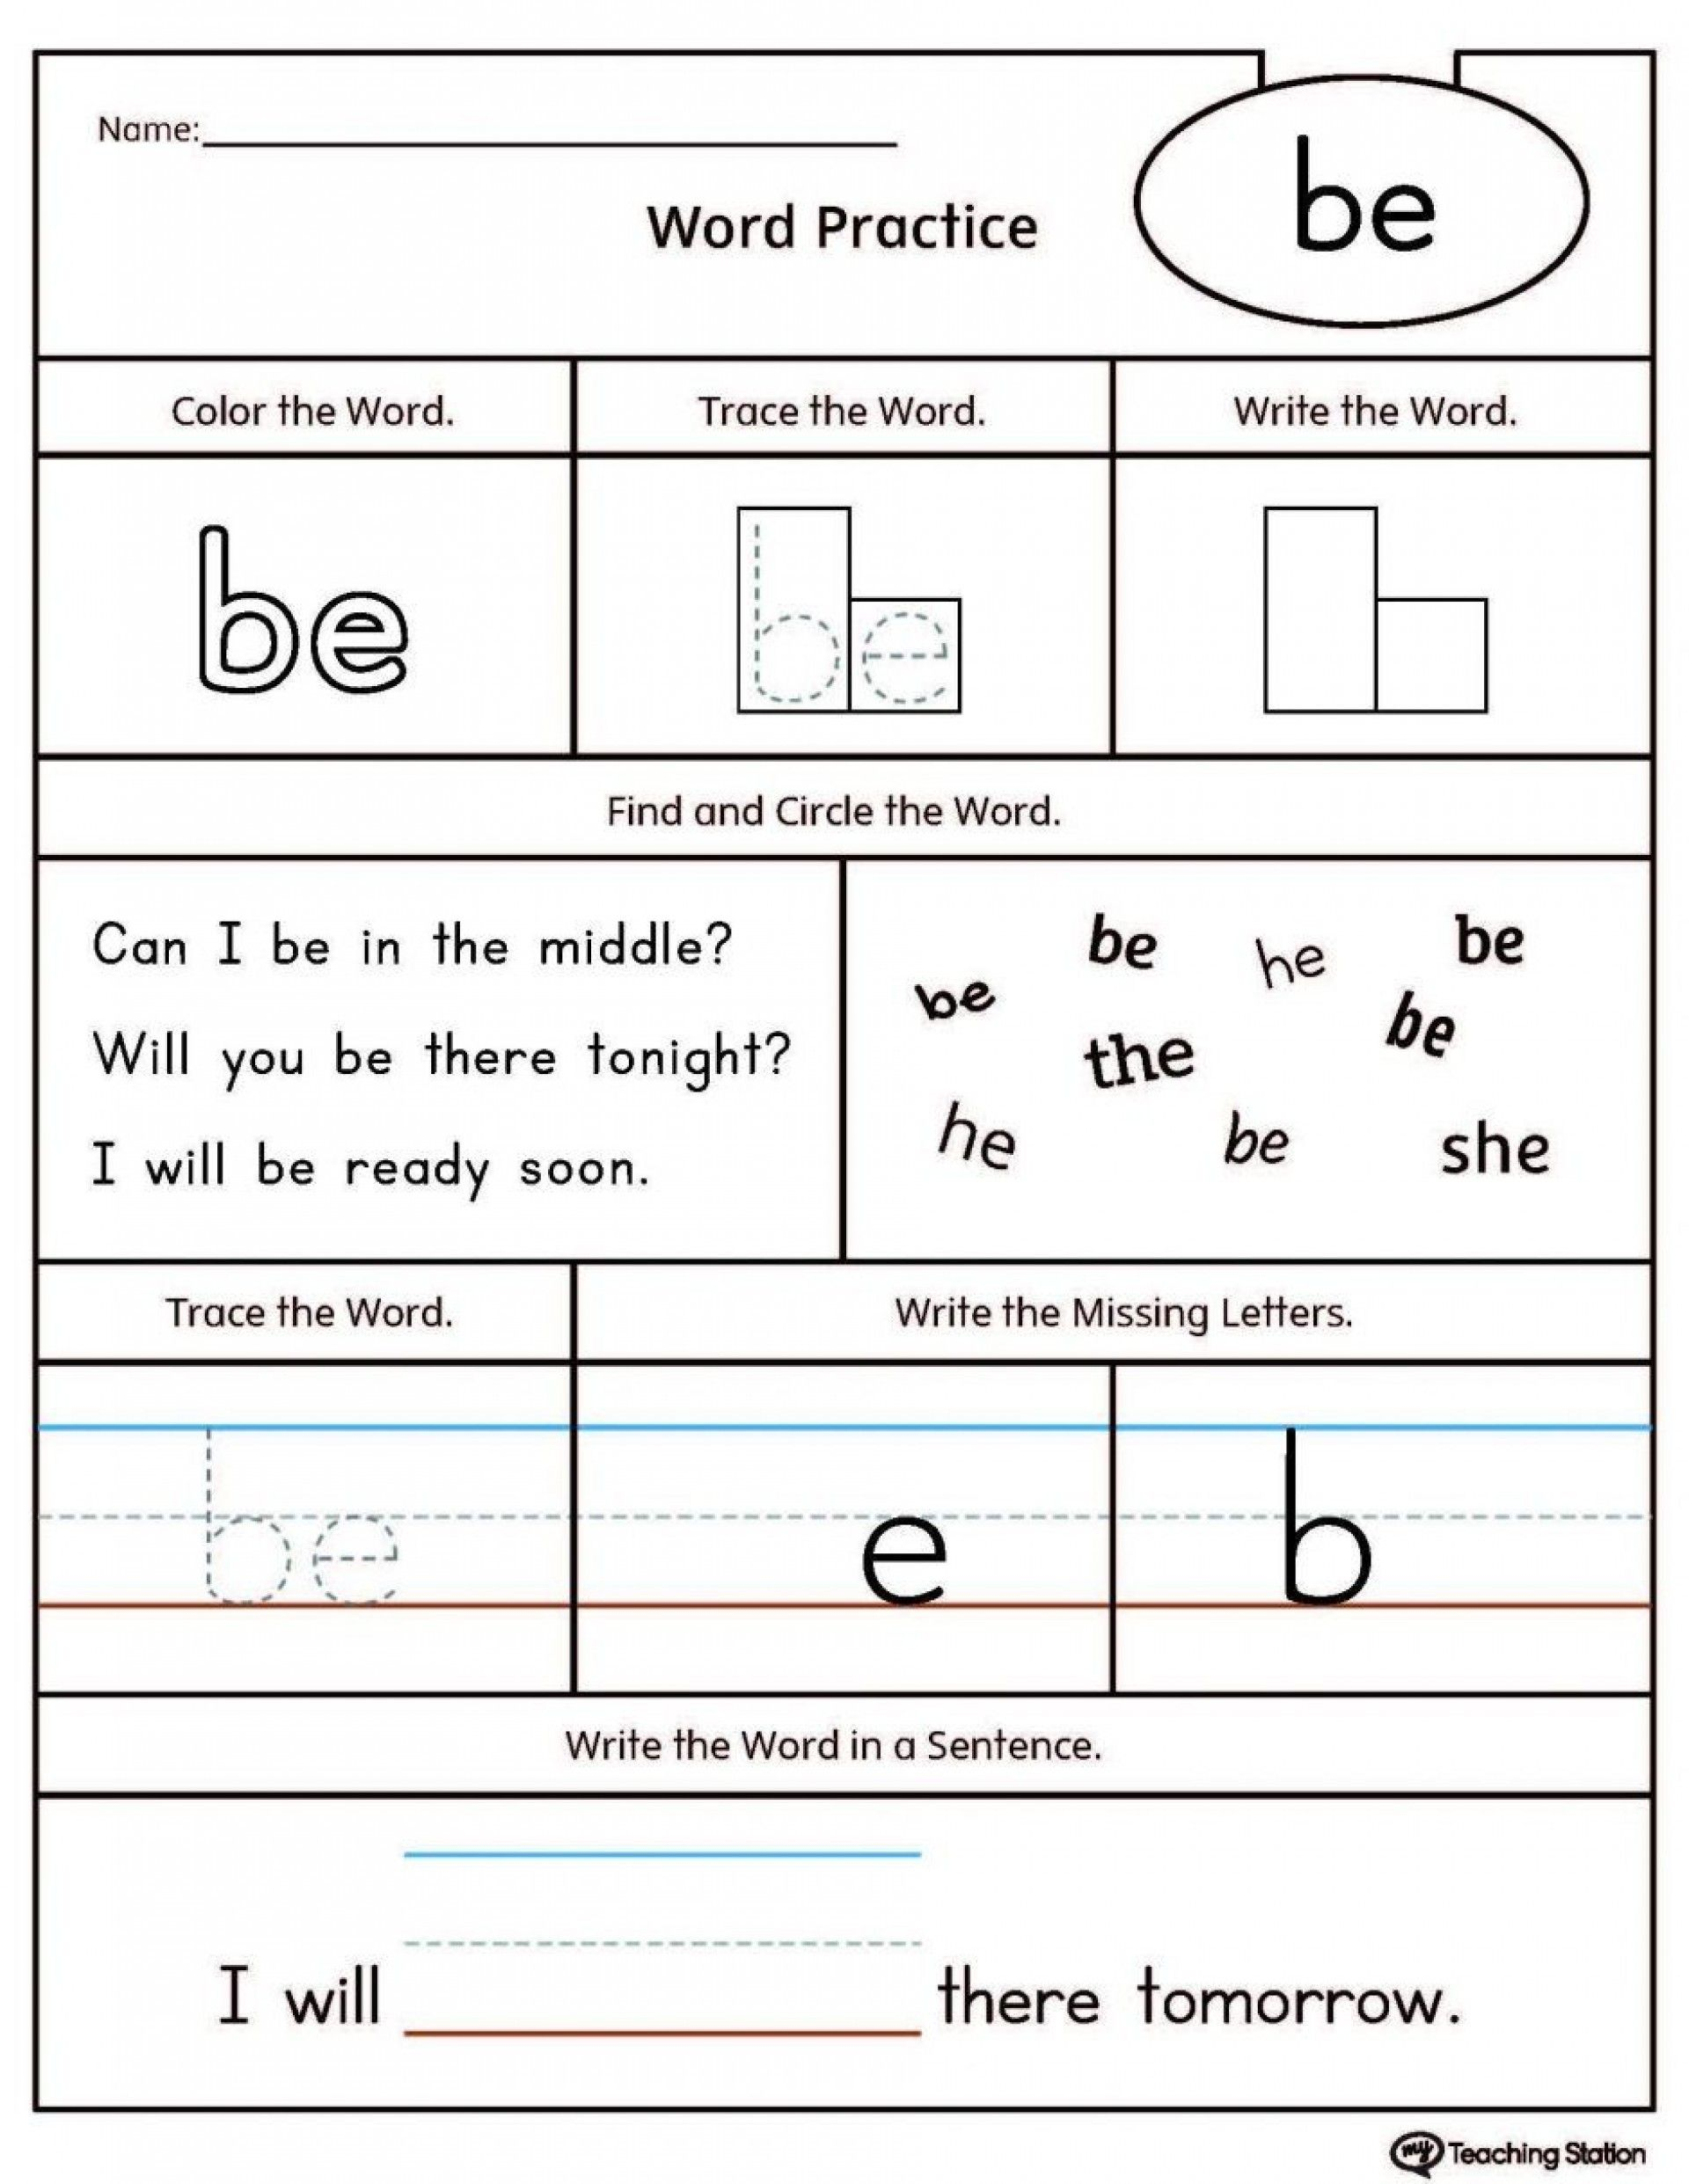 Word Practice